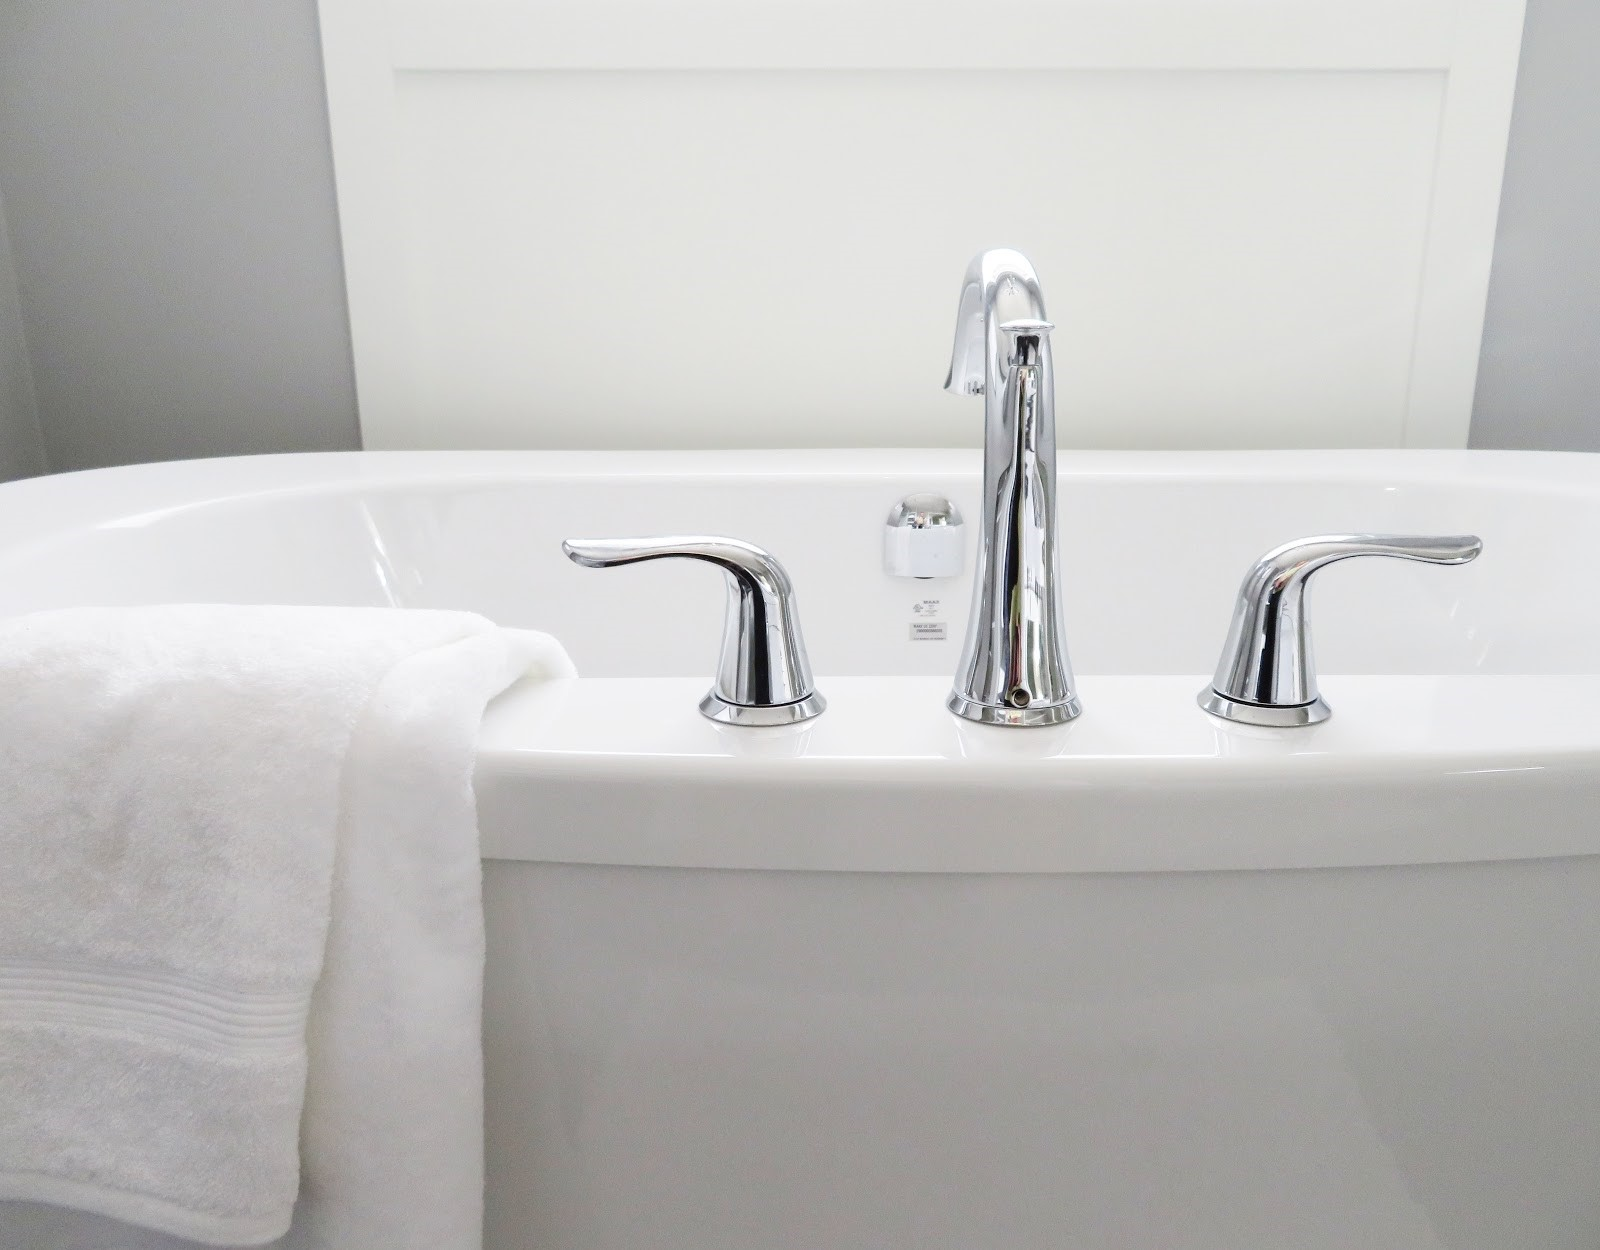 In bad gaan: wat kost dat? #badkamer #badkamerinspiratie #bad #energie